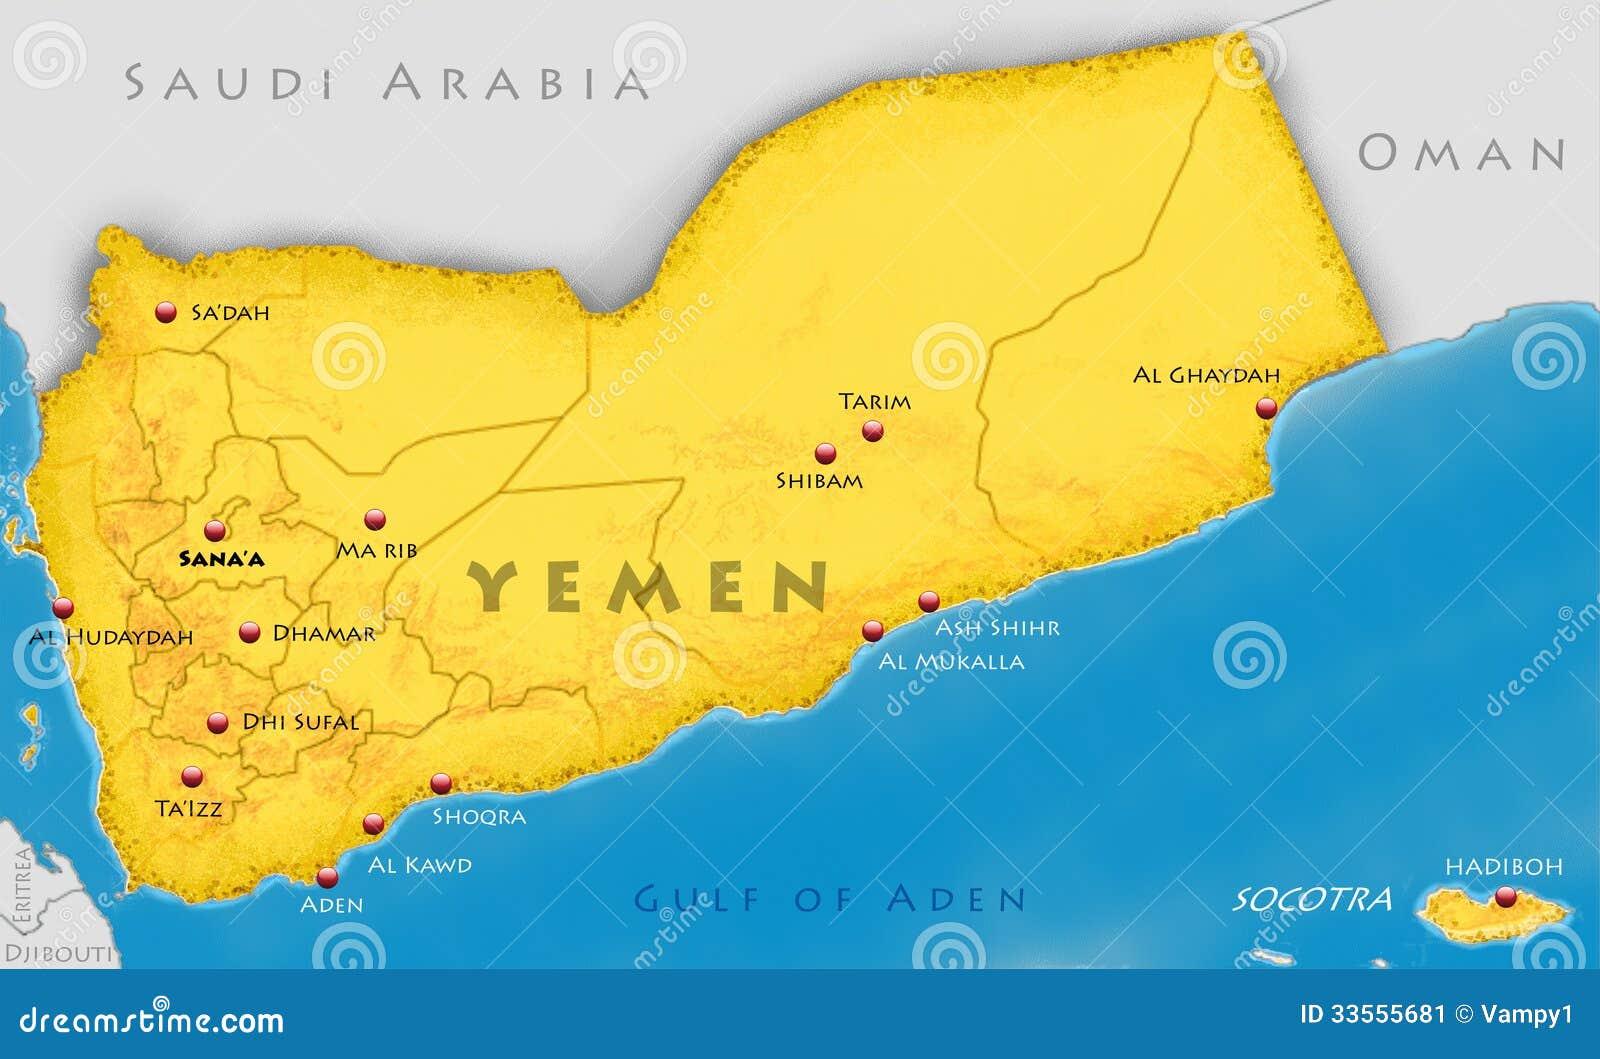 republic-yemen-map-socotra-island-33555681 Sanaa Yemen Map on yemen ethnic map, hadhramaut map, cia yemen map, n'djamena chad map, yemen saudi arabia map, ibb yemen map, red sea map, yemen on map, yemen climate map, riyadh saudi arabia map, aden yemen map, mukalla yemen map, yemen world map, yemen capital map, old yemen map, caspian sea map, yemen country map, yemen arab republic map, rada yemen map, dubai uae map,